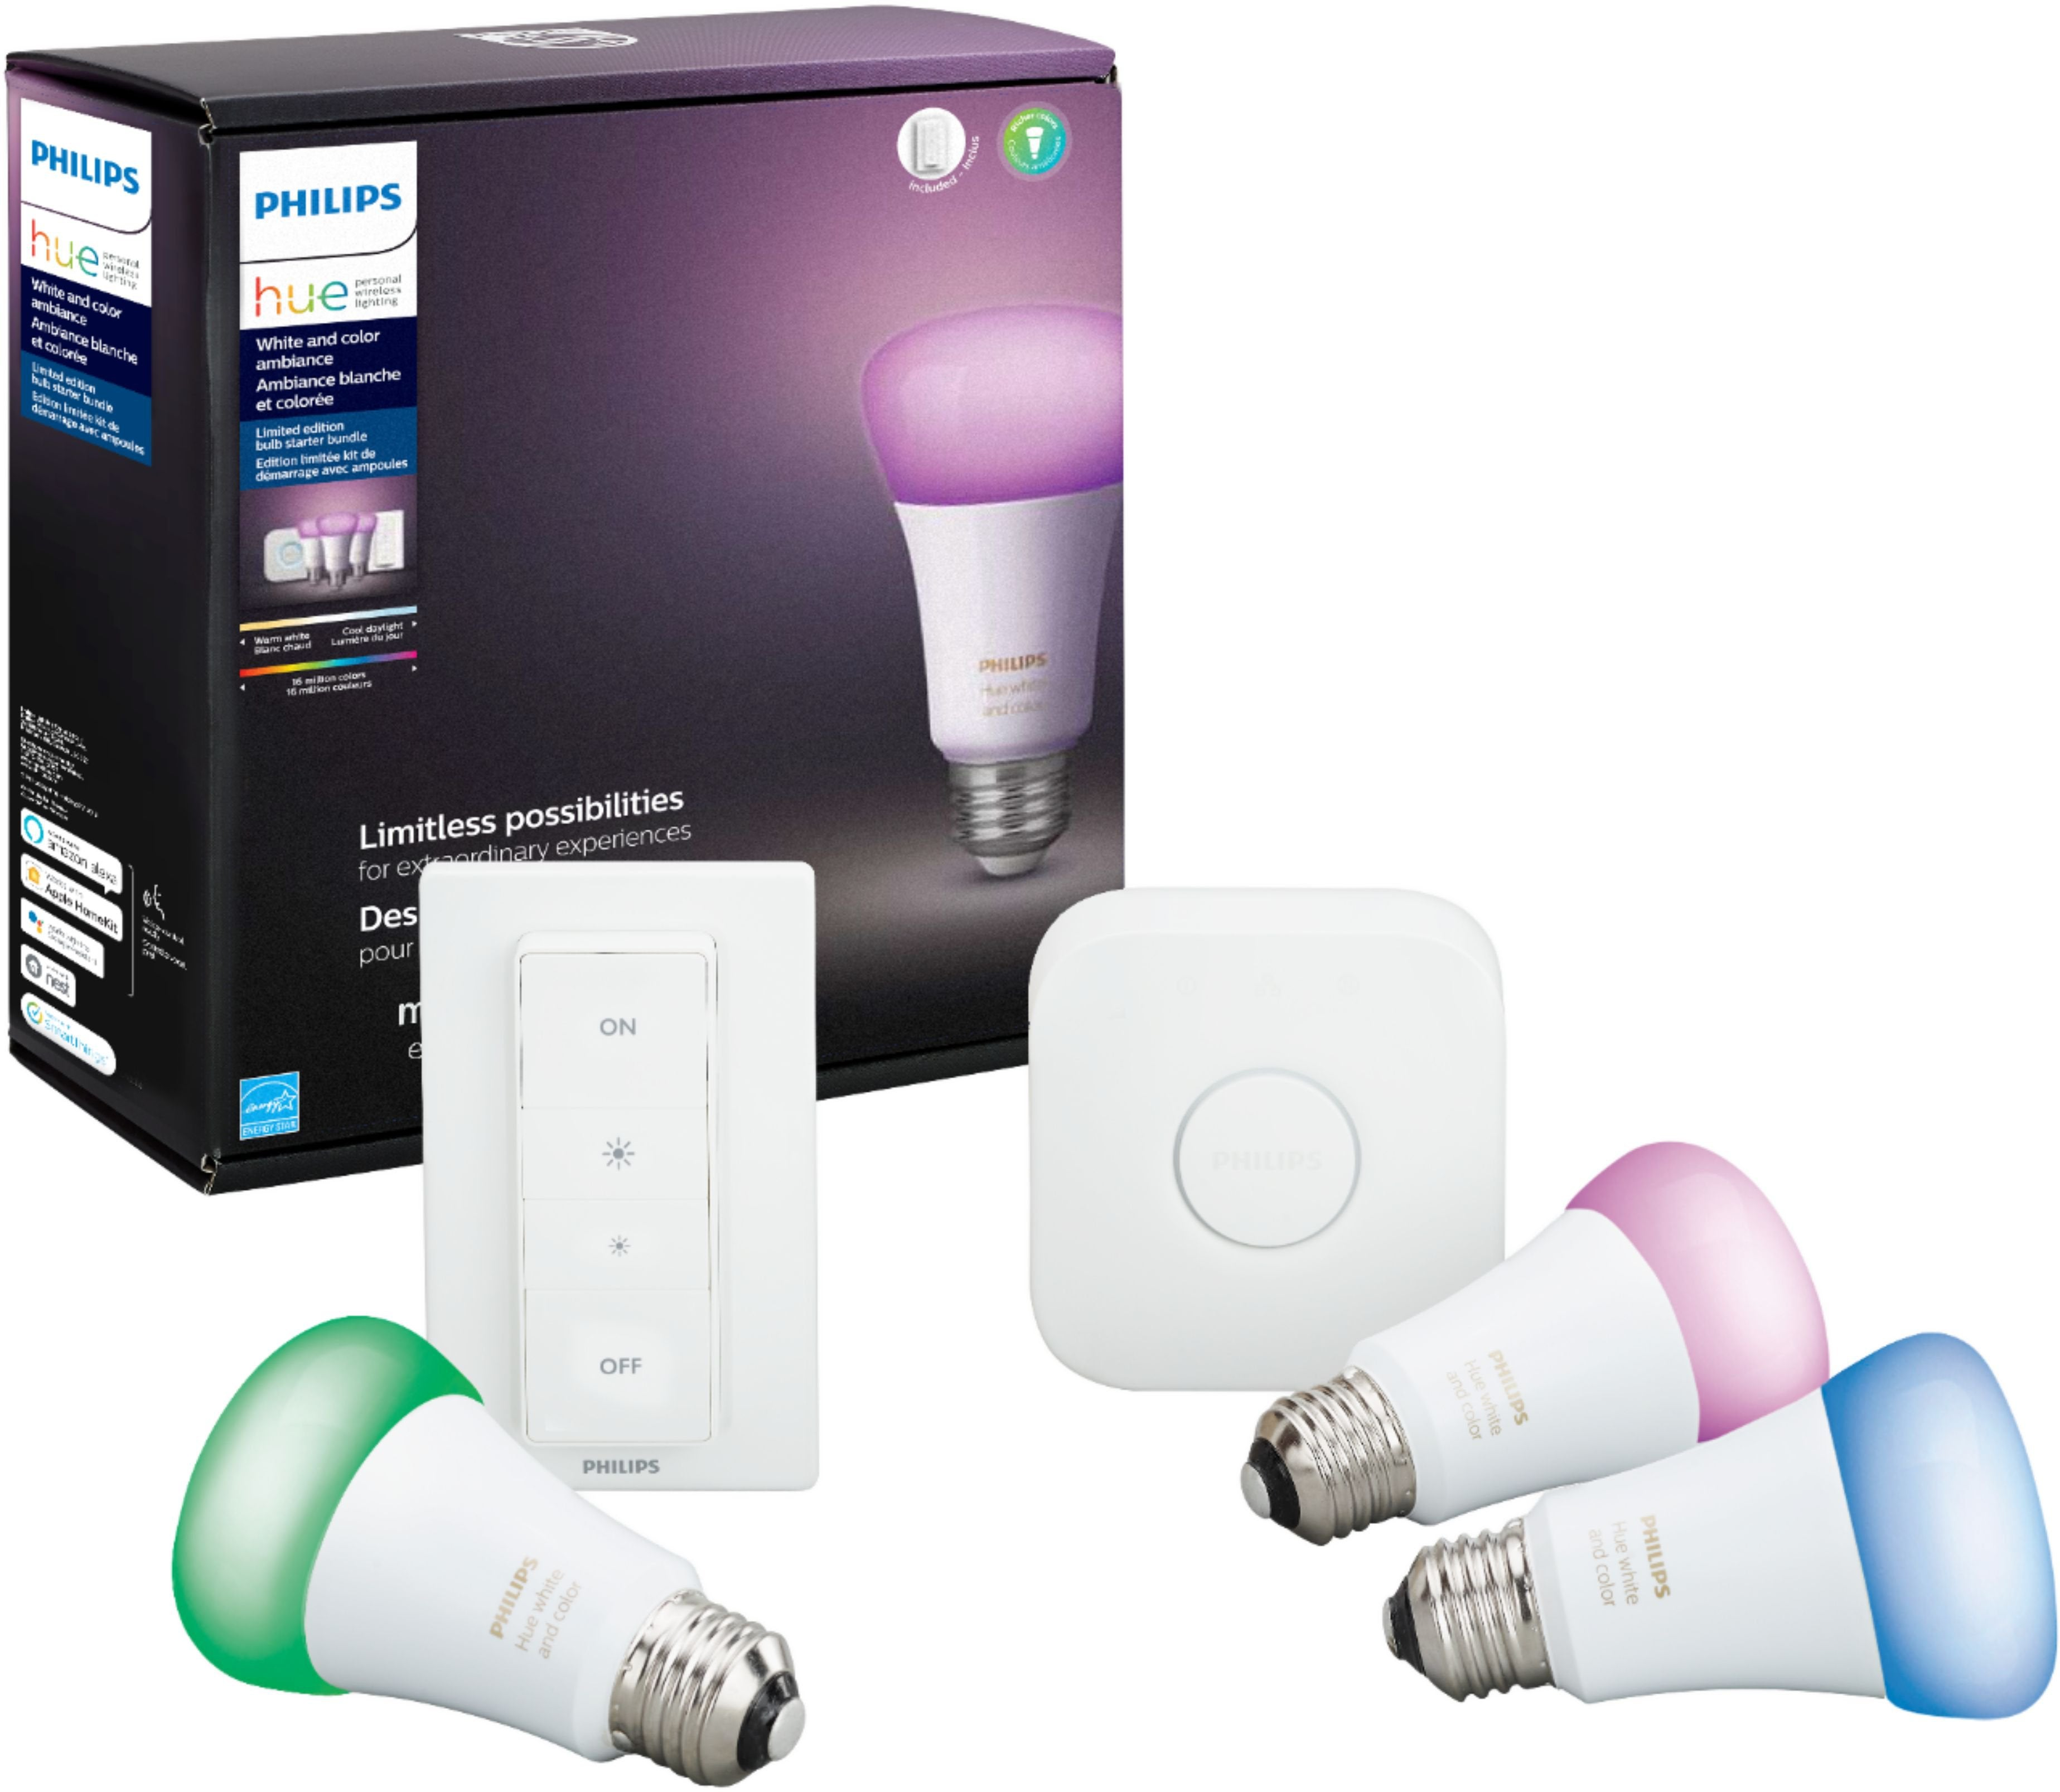 Philips Hue White Color Ambiance LED Starter Kit Multicolor